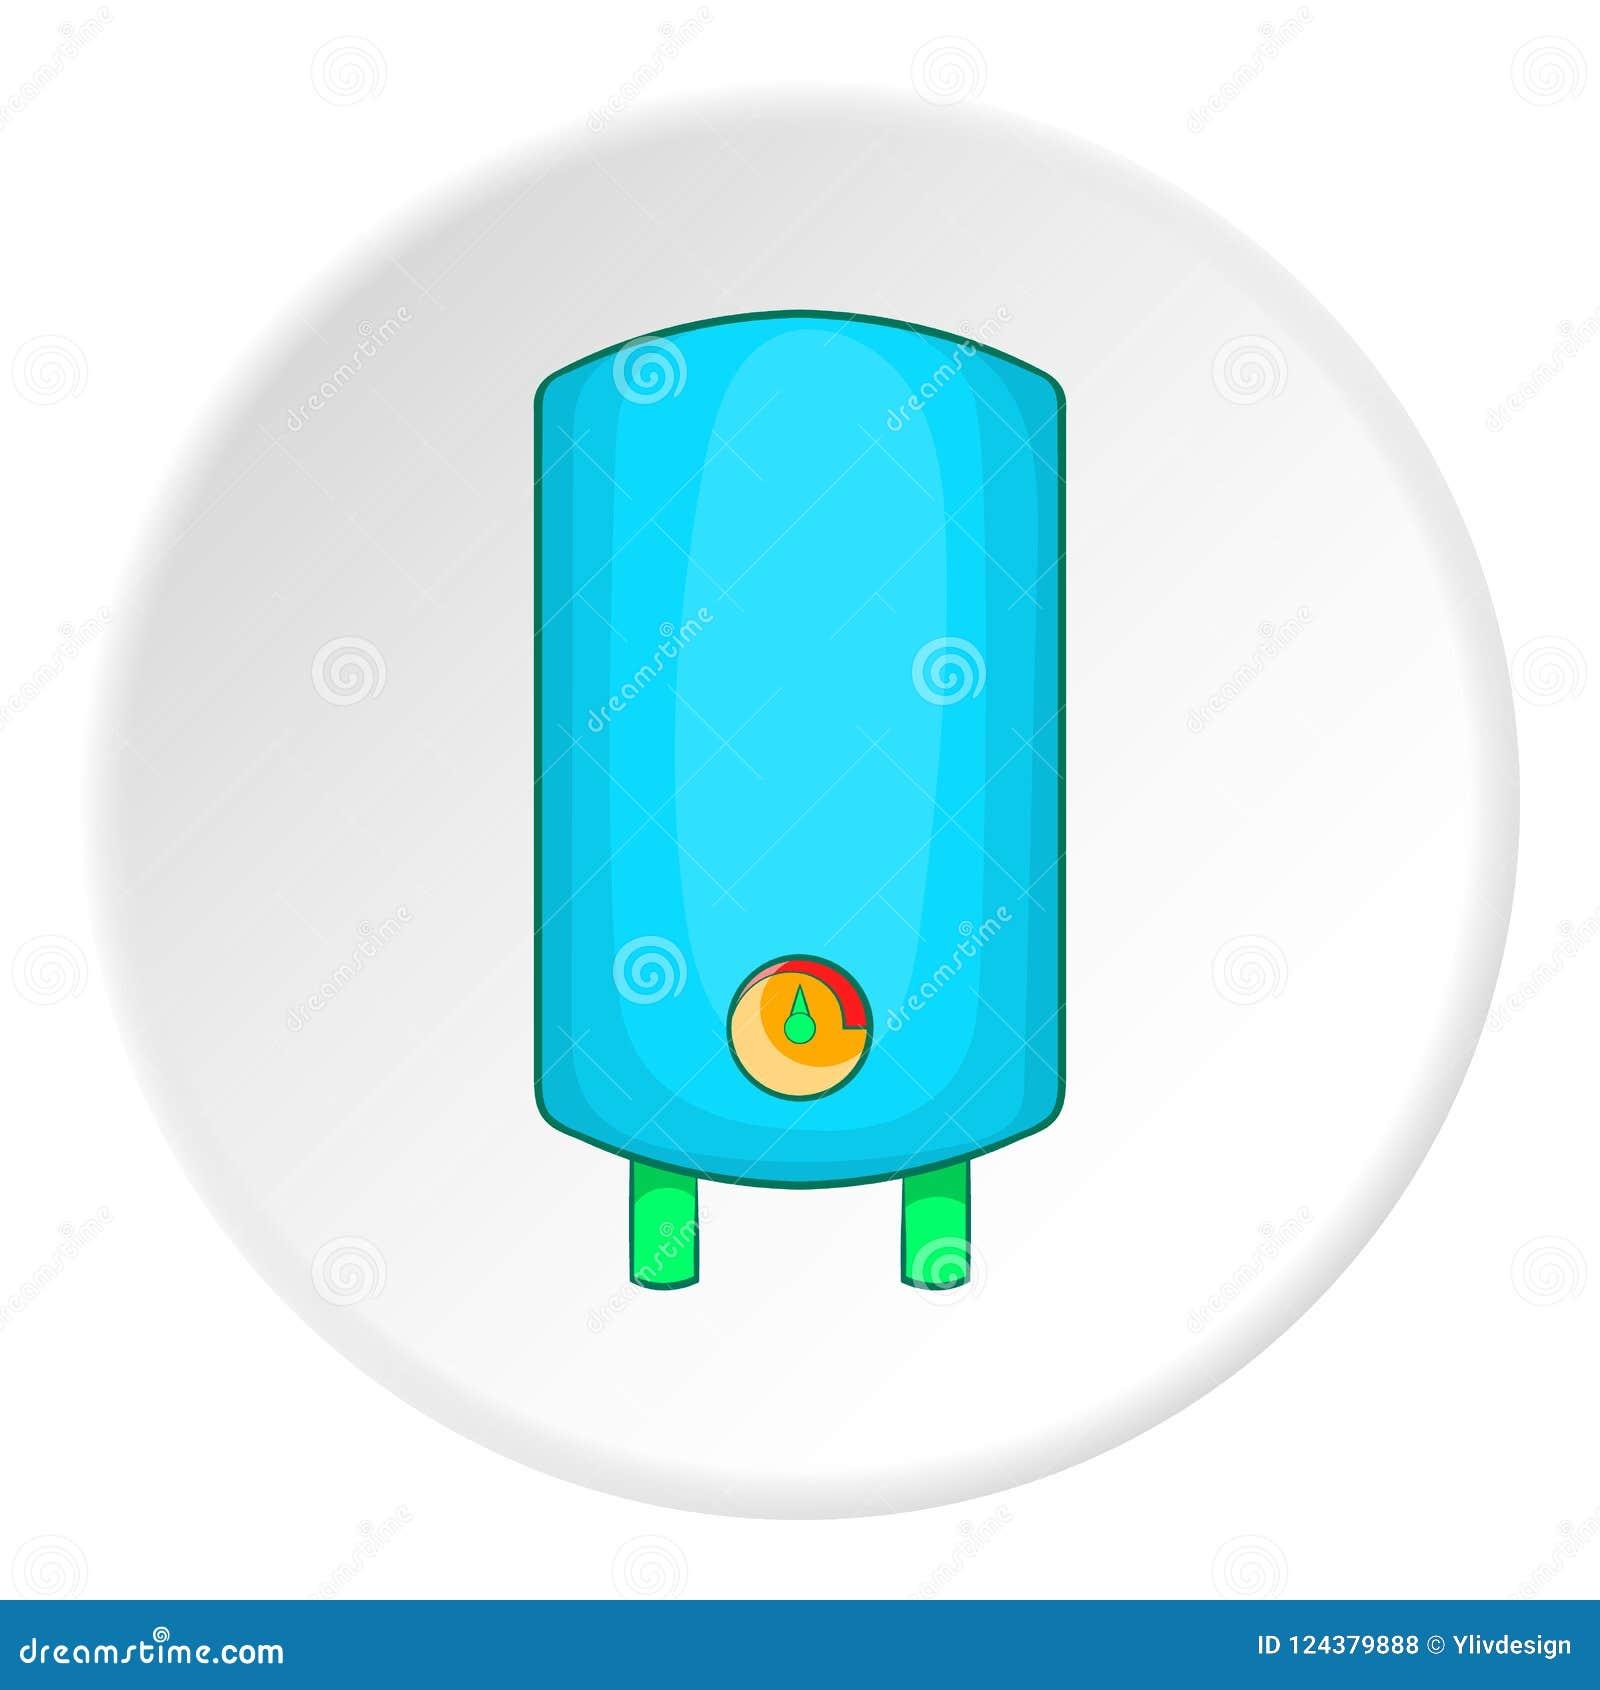 Boiler Or Water Heater Icon, Cartoon Style Stock Illustration ...